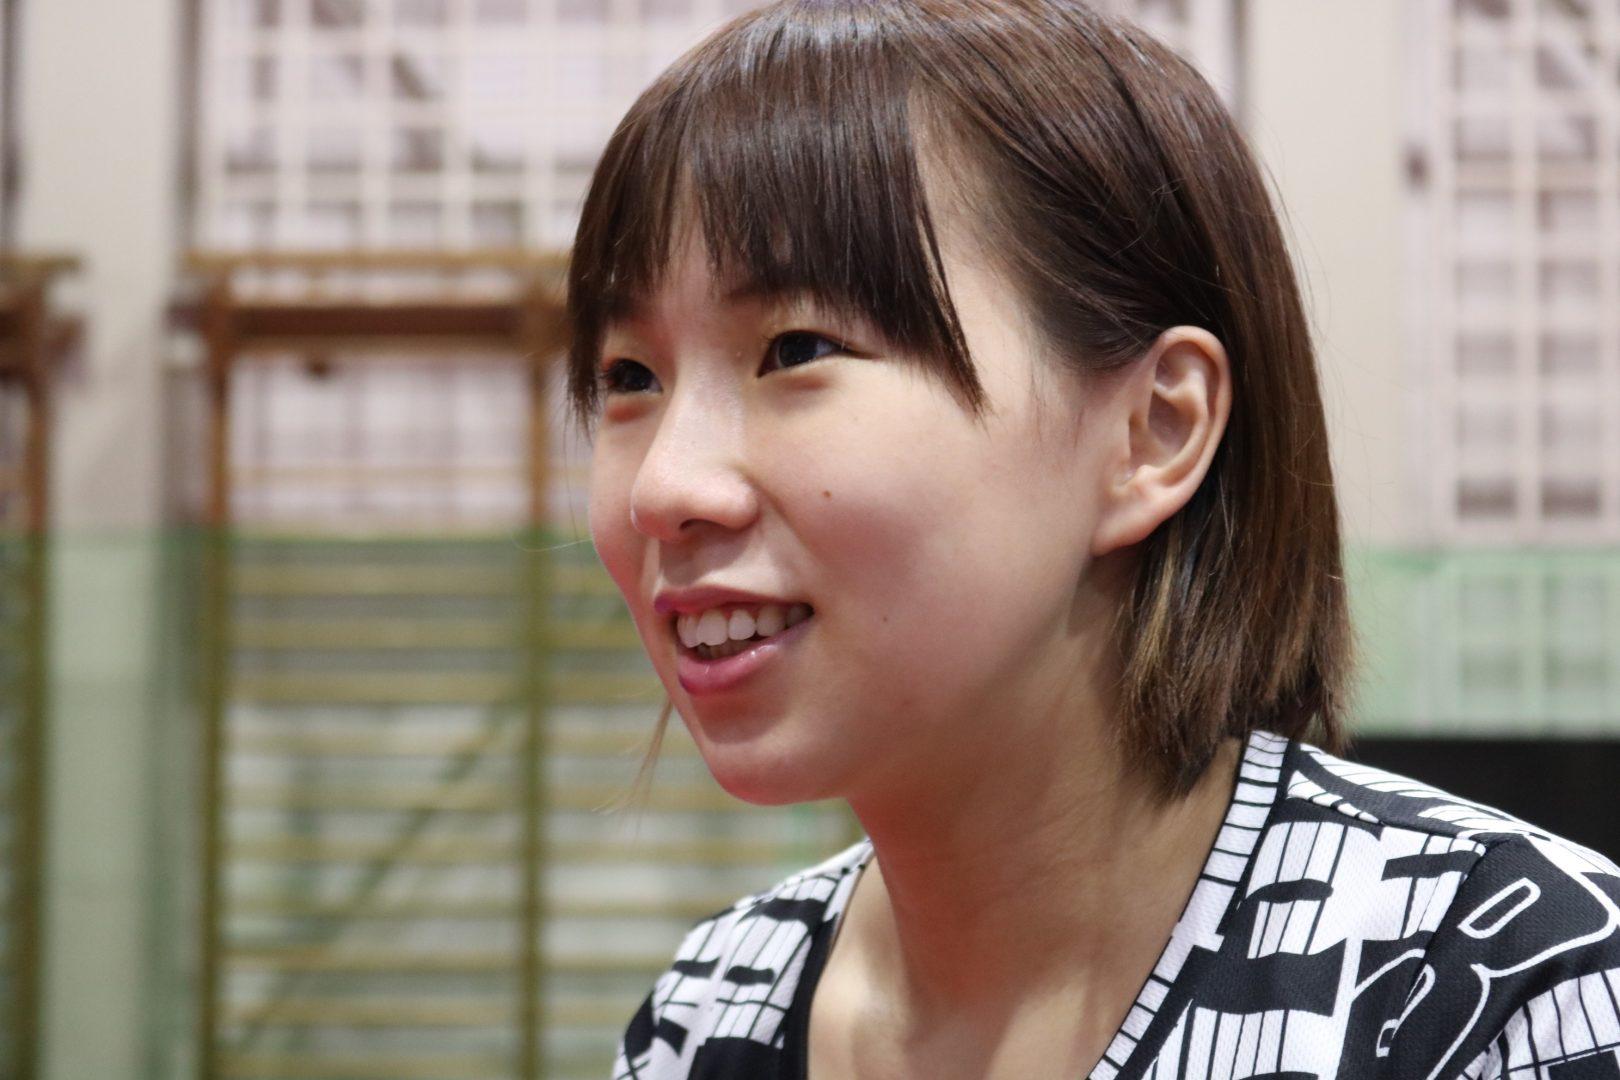 Tへ参戦。大阪の地震で変わった松平志穂の「卓球観」【Tリーグ】